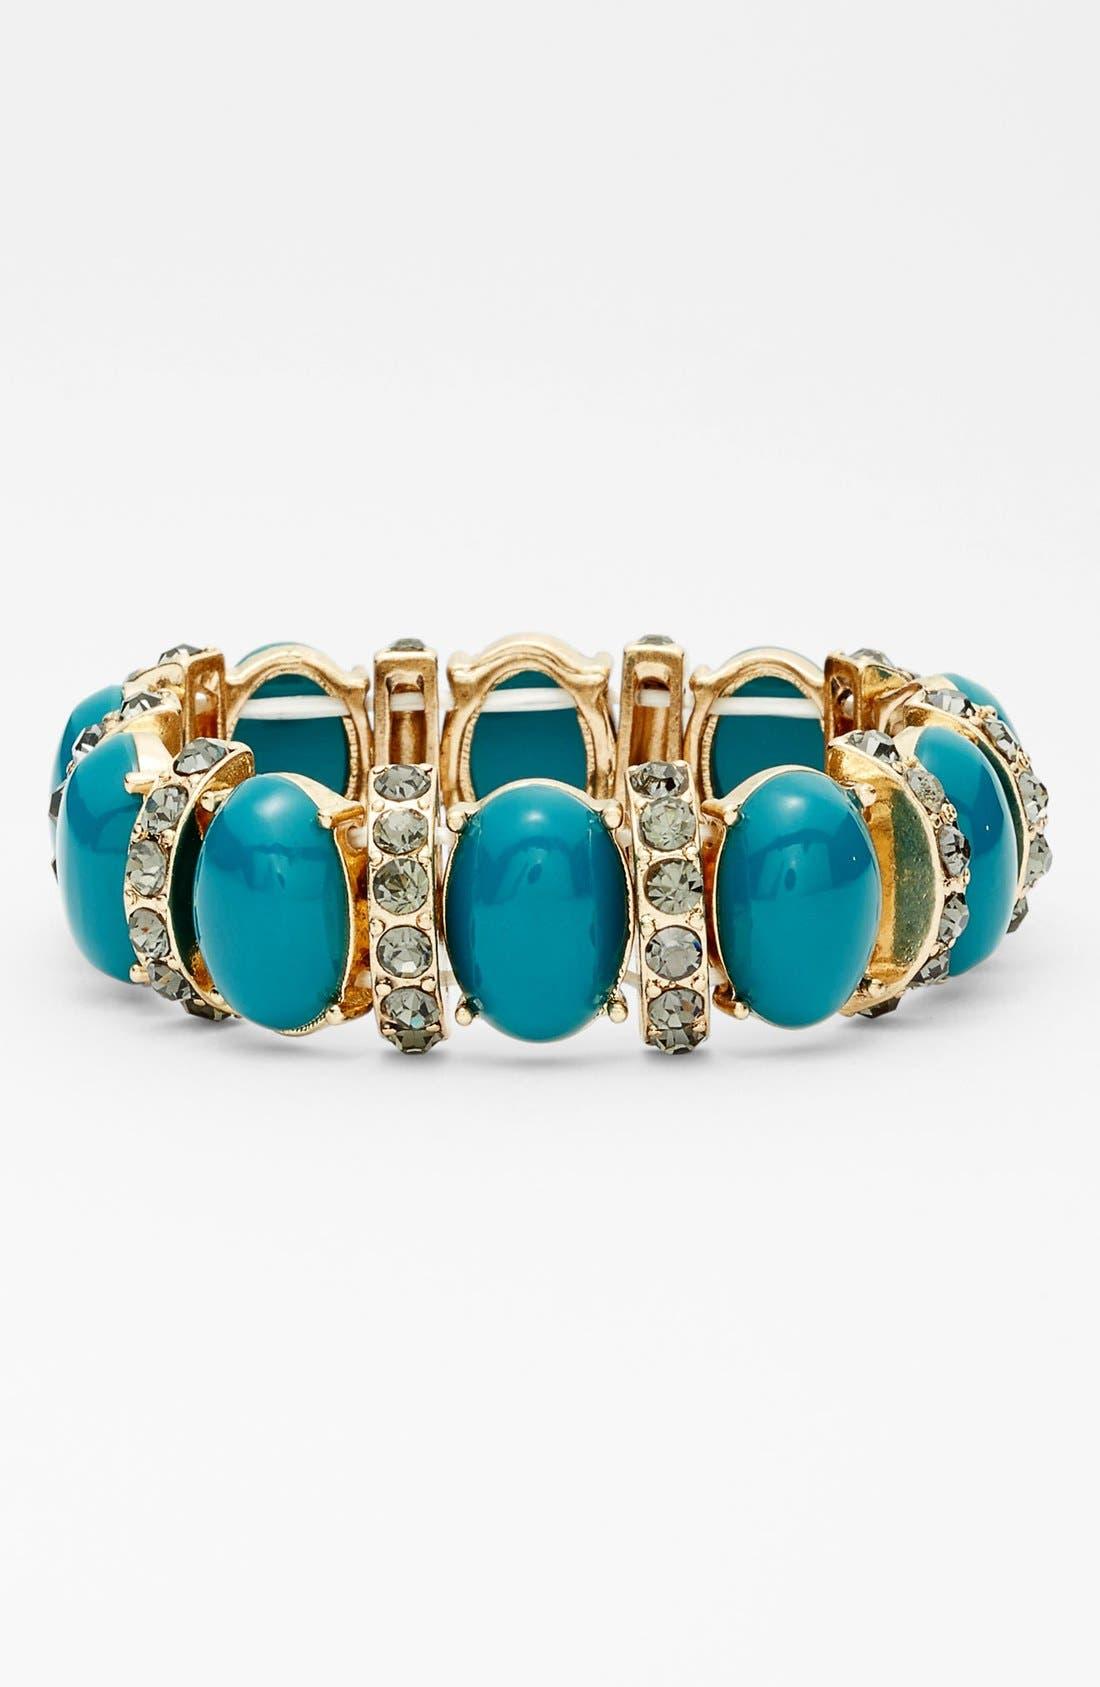 Alternate Image 1 Selected - Tasha Oval Stone & Crystal Bar Stretch Bracelet